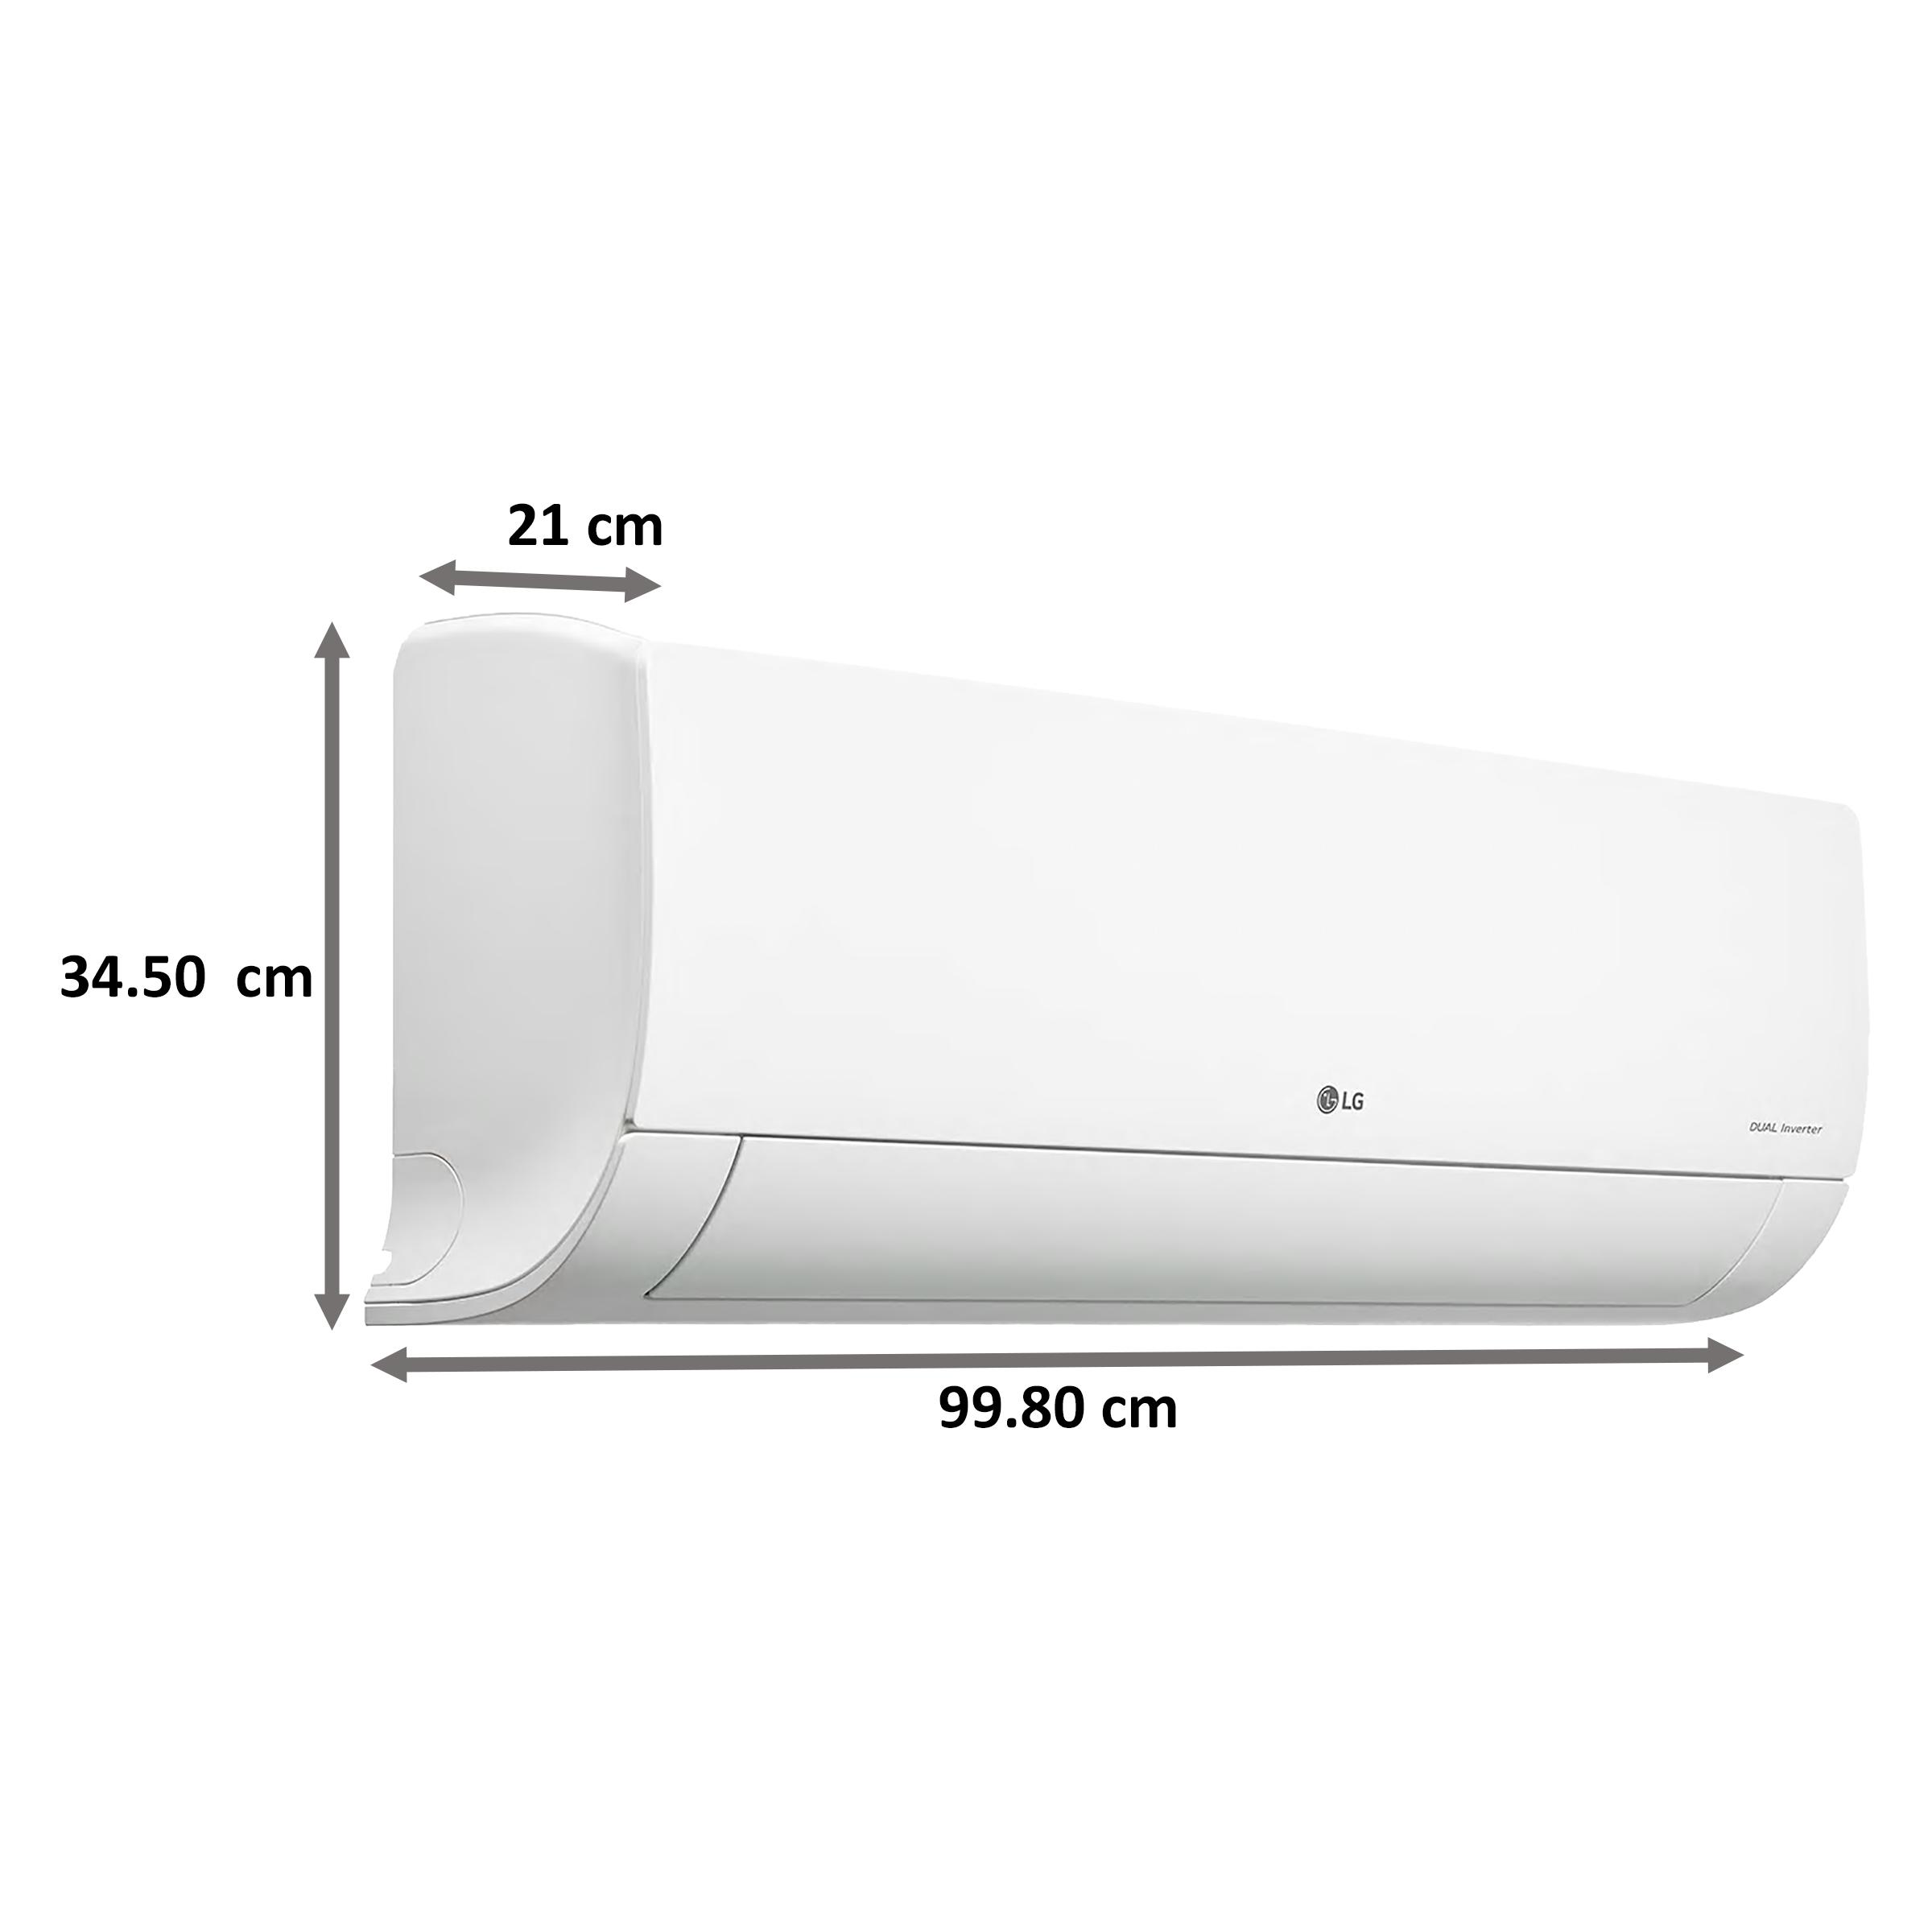 LG 1.5 Ton 5 Star Inverter Split AC (Air Purification Filter, Copper Condenser, MS-Q18ANZA, White)_3